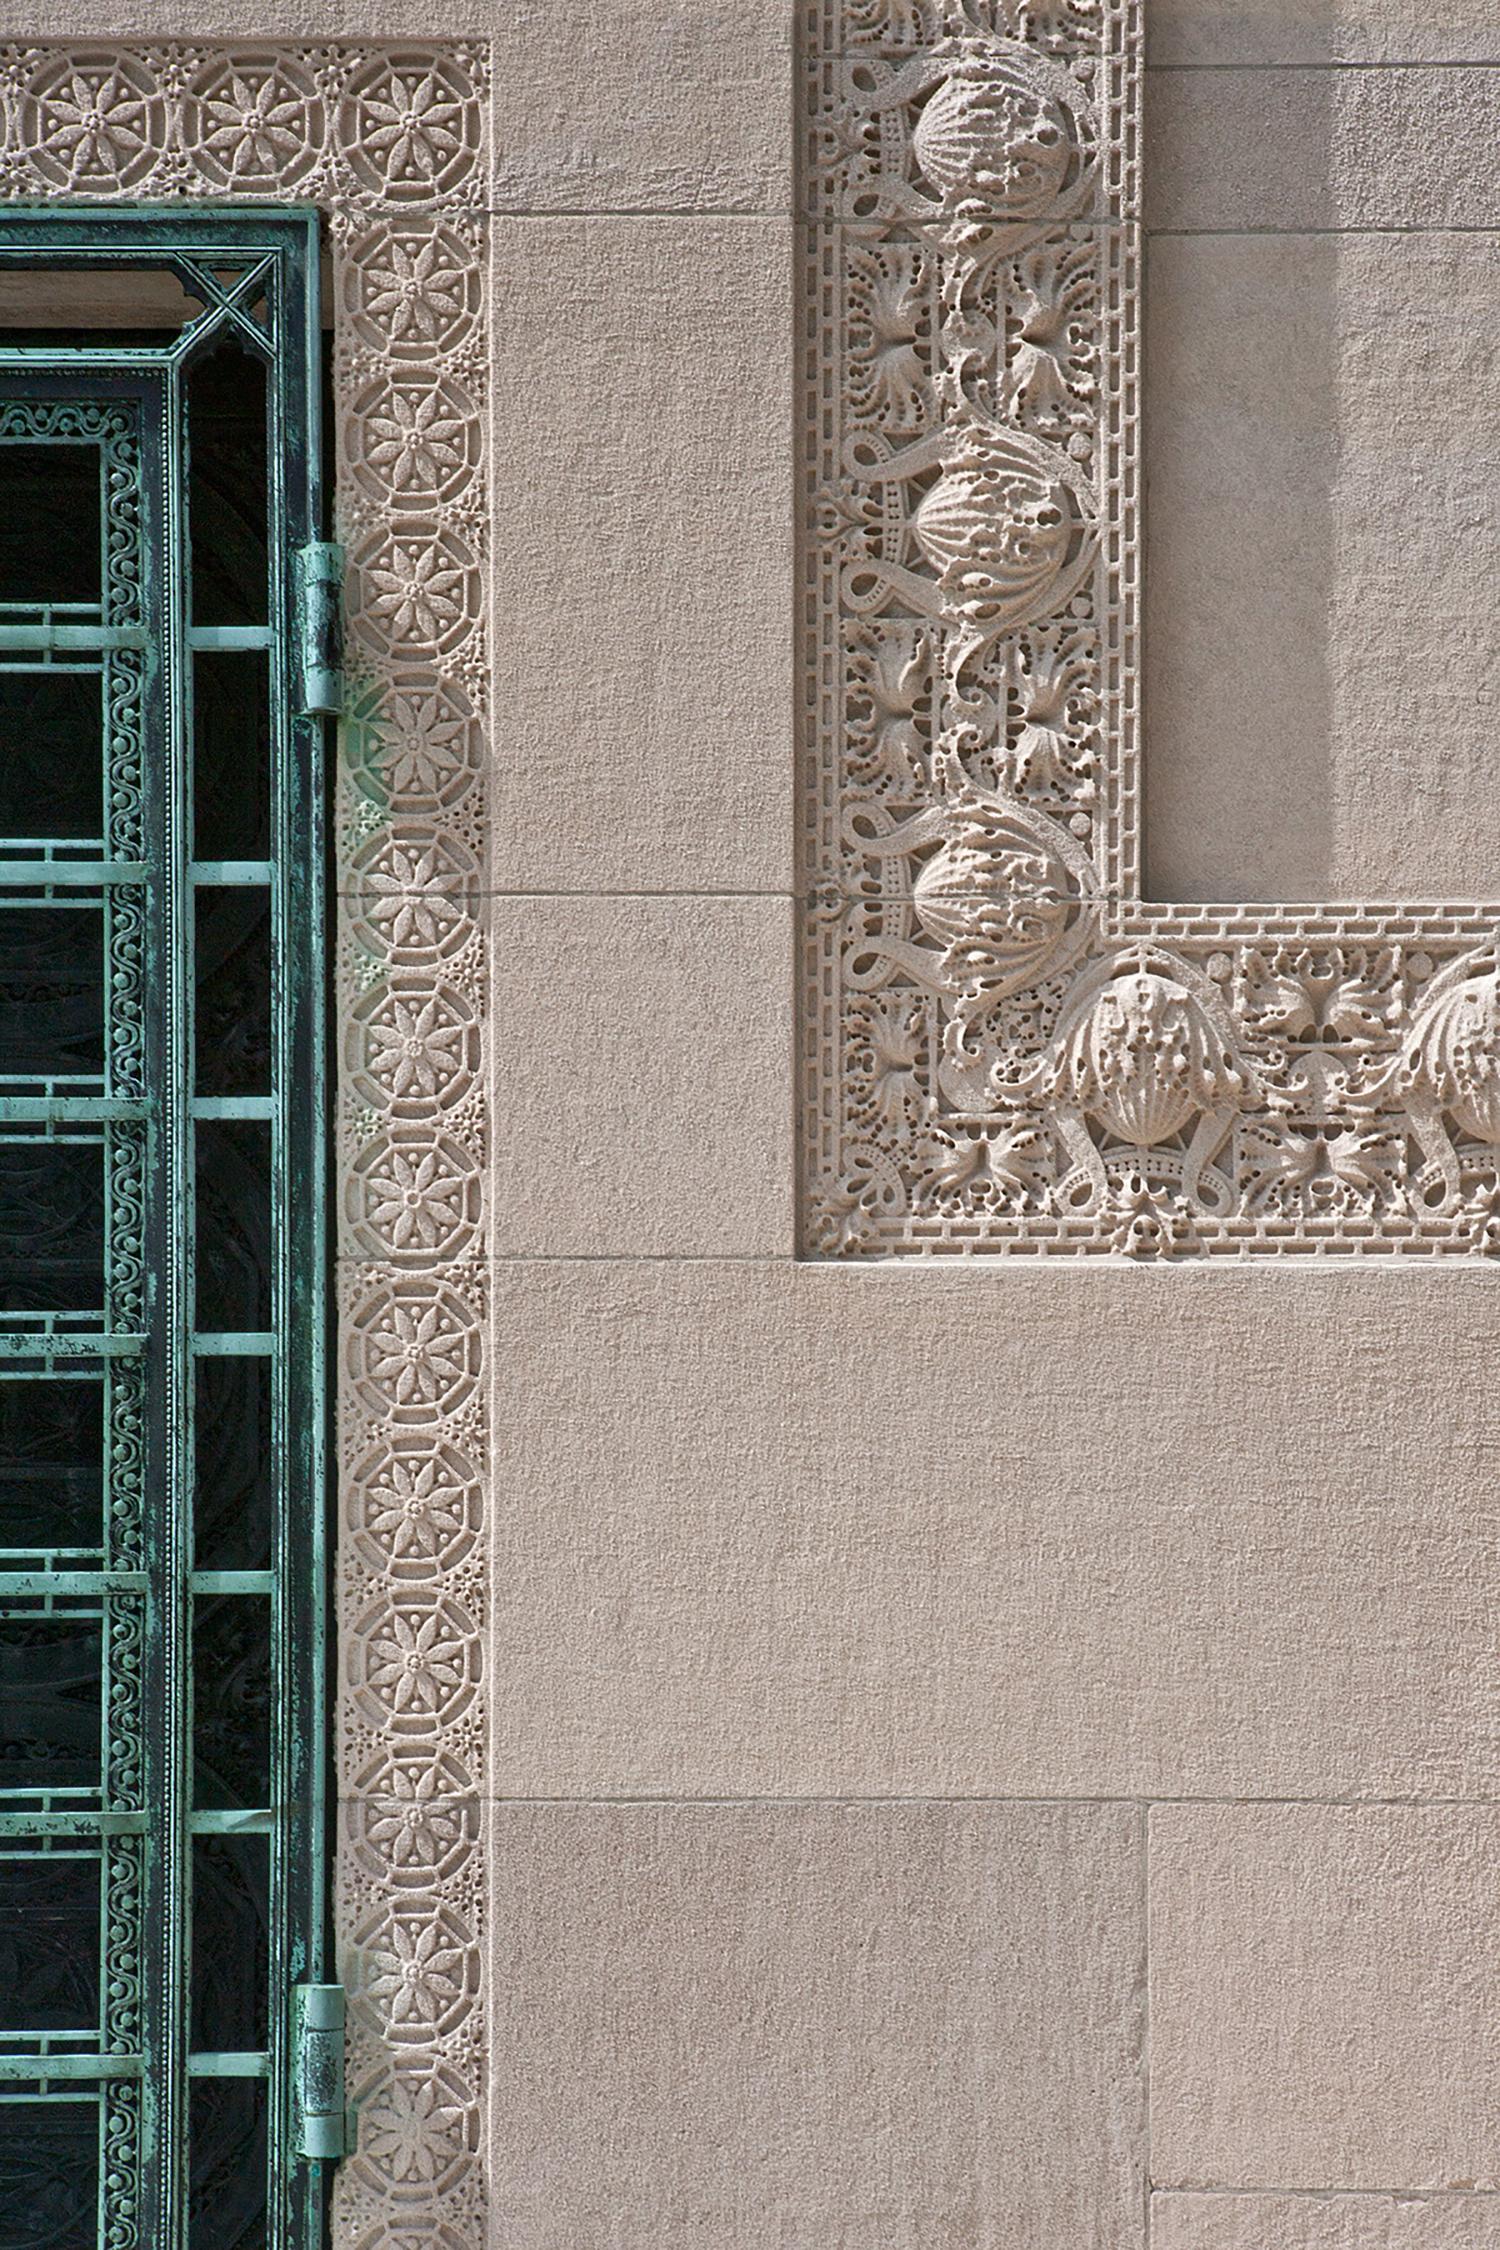 Wainwright Tomb / Adler & Sullivan / St. Louis MO